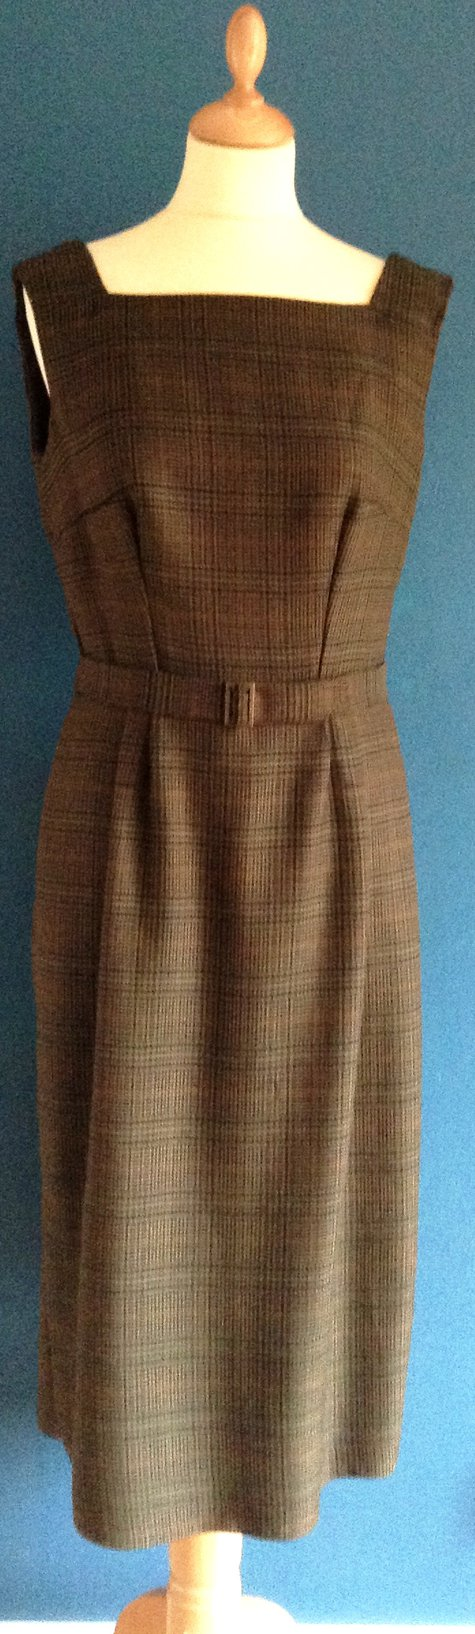 Brown_dress_pics_021_large